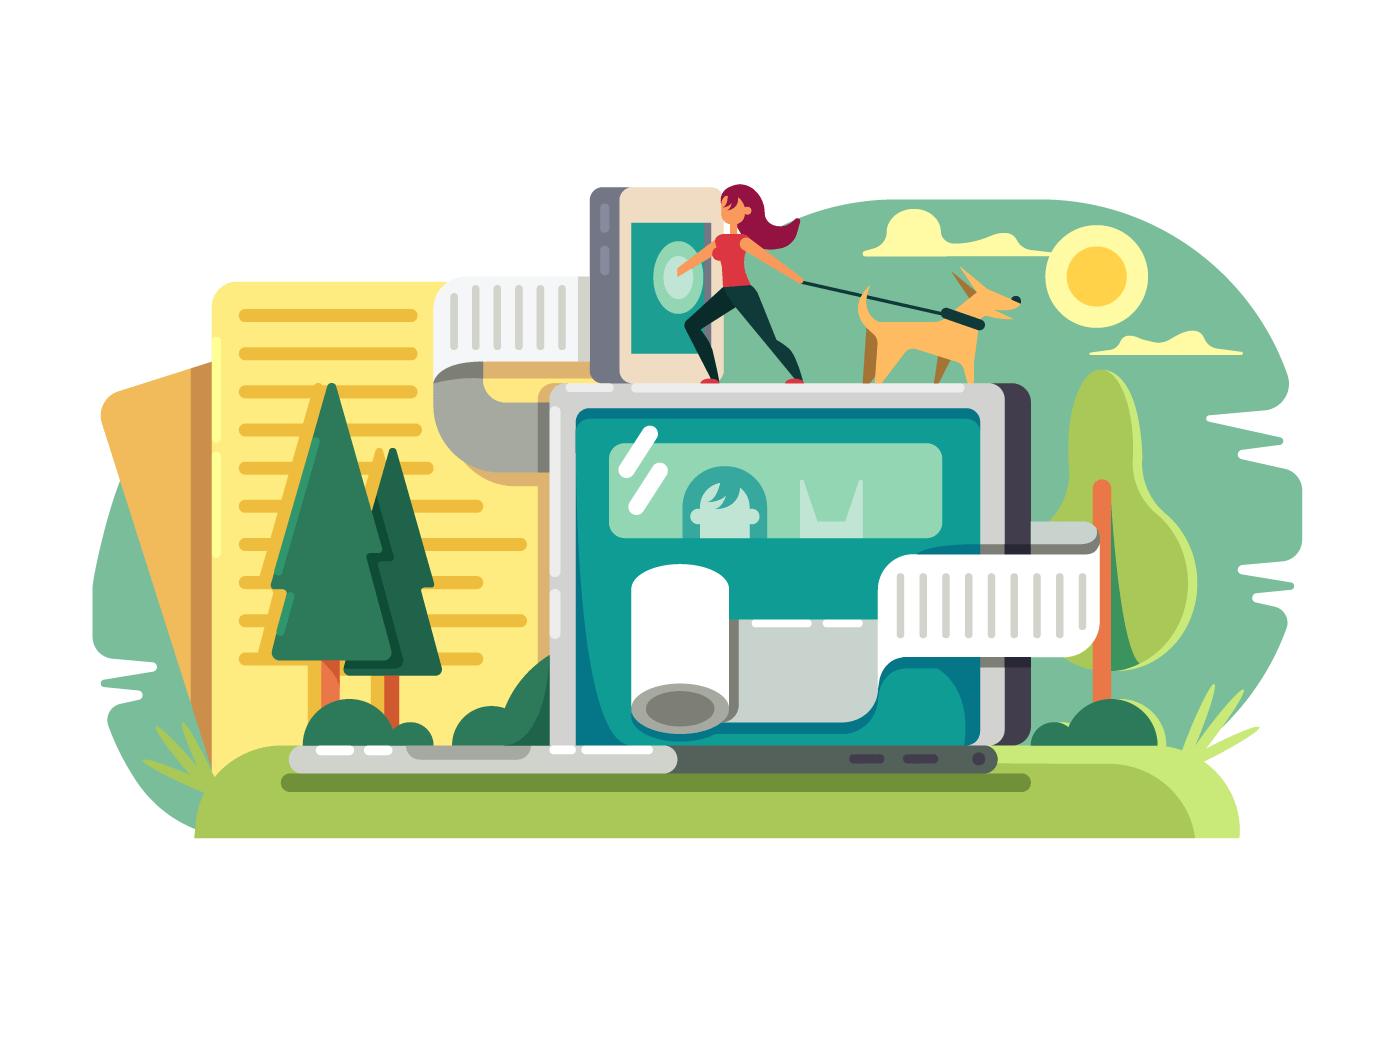 Web blog illustration